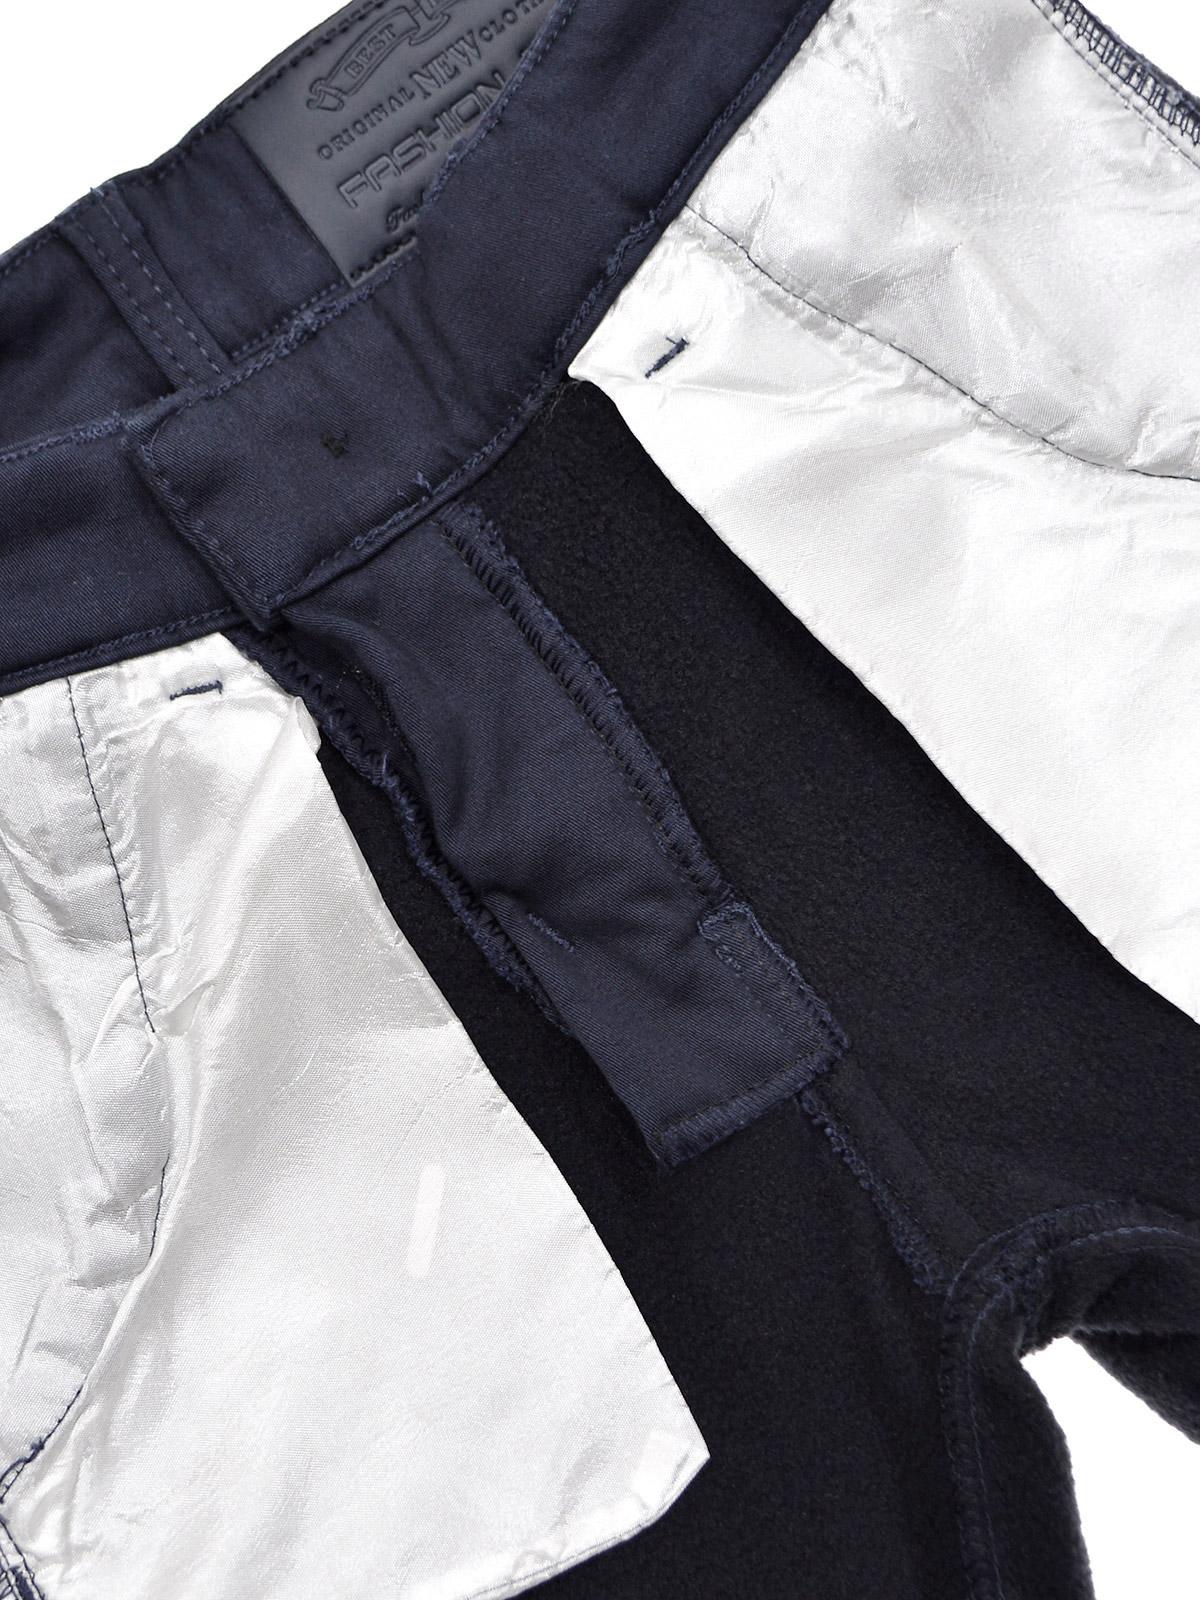 Enfants-Chino-THERMO-d-039-hiver-Pantalons-Garcons-Pantalon-Doublure-Stretch-Reglable-22904 miniature 16